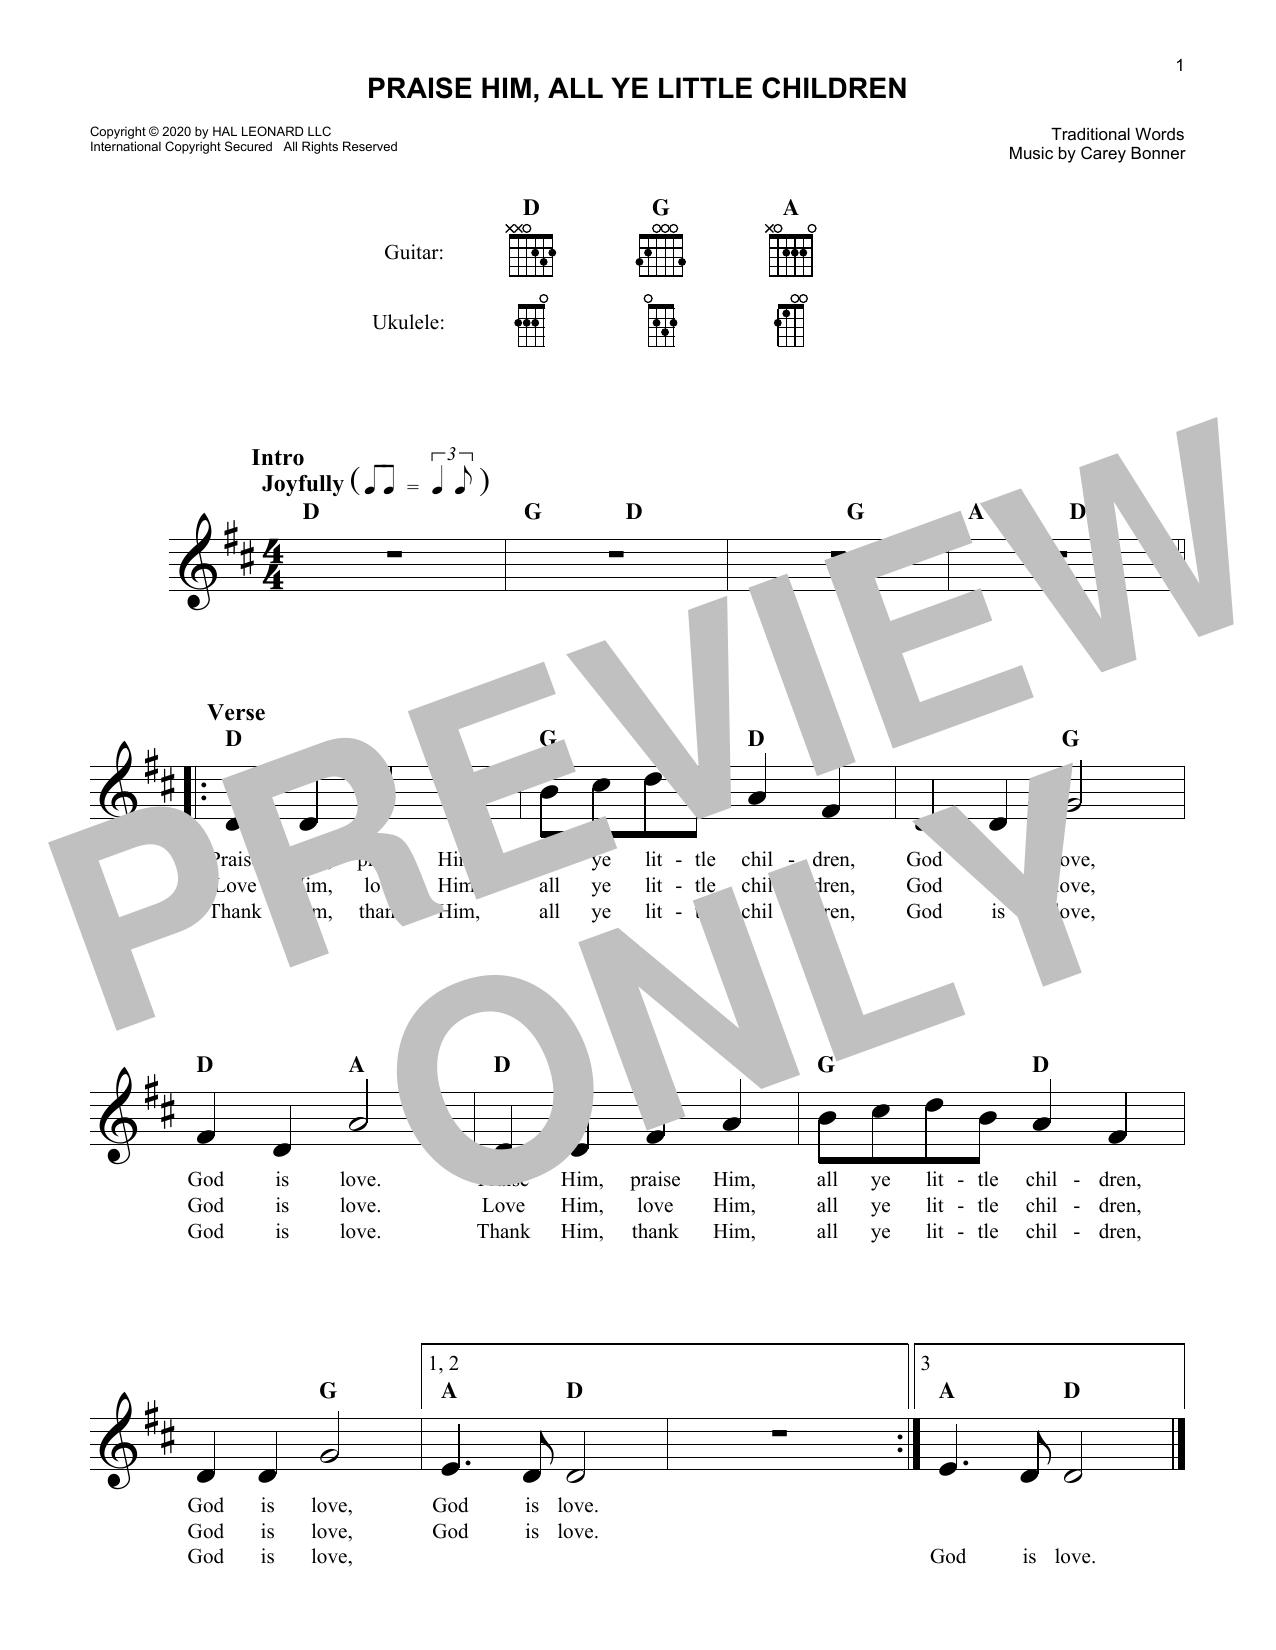 Carey Bonner Praise Him, All Ye Little Children sheet music notes and chords. Download Printable PDF.